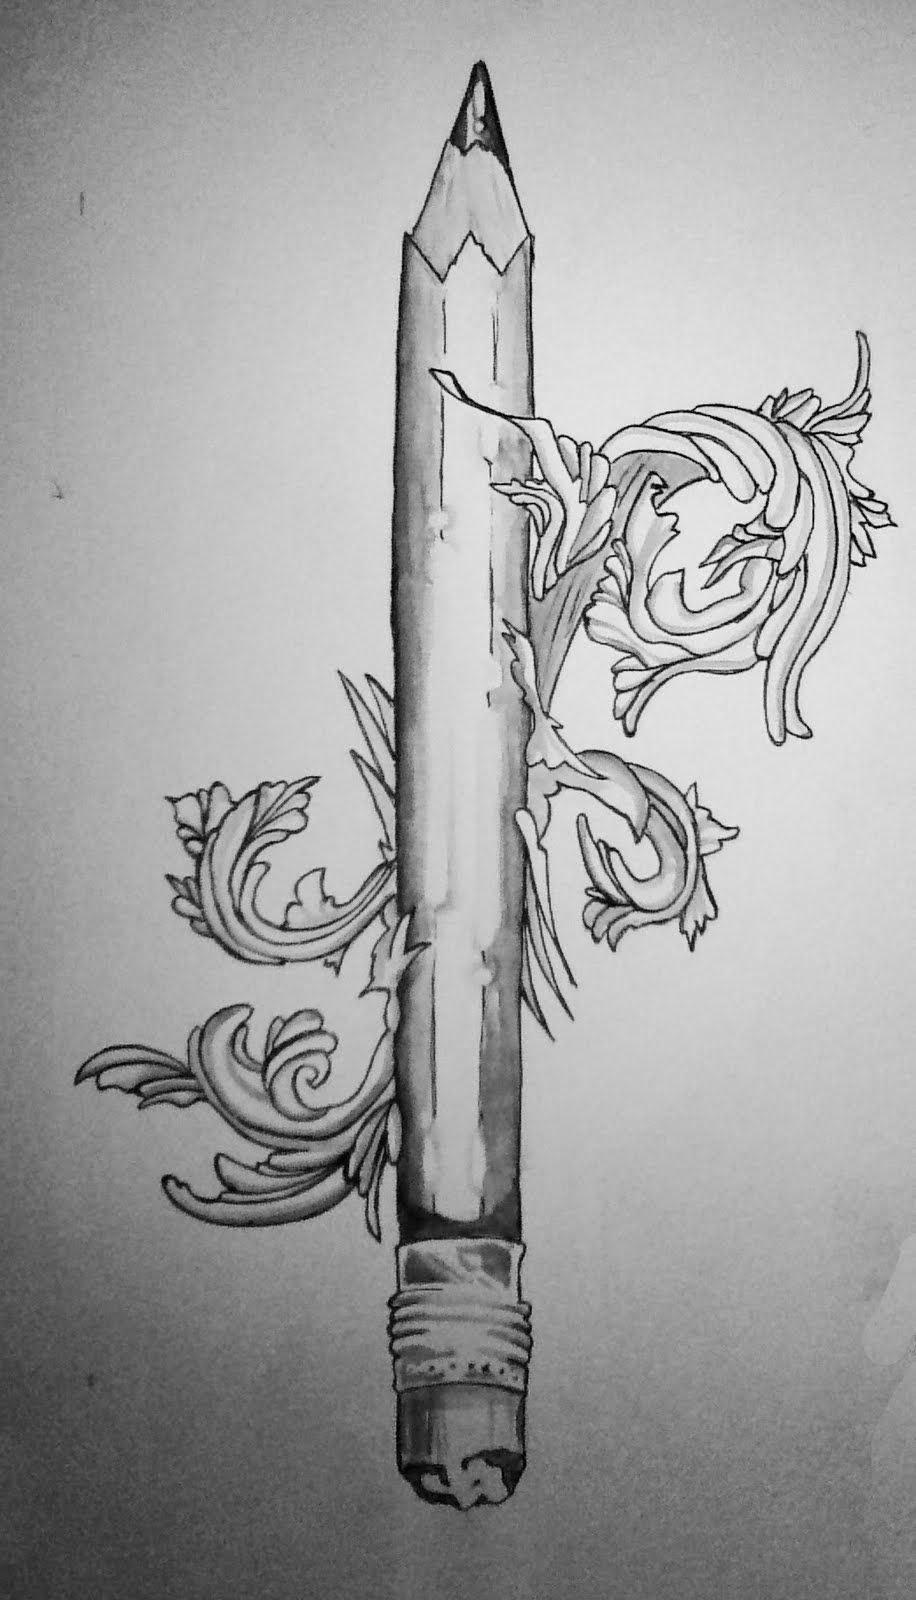 916 1600 tattoo ideas pinterest tattoo designs leaf tattoos and tattoo. Black Bedroom Furniture Sets. Home Design Ideas